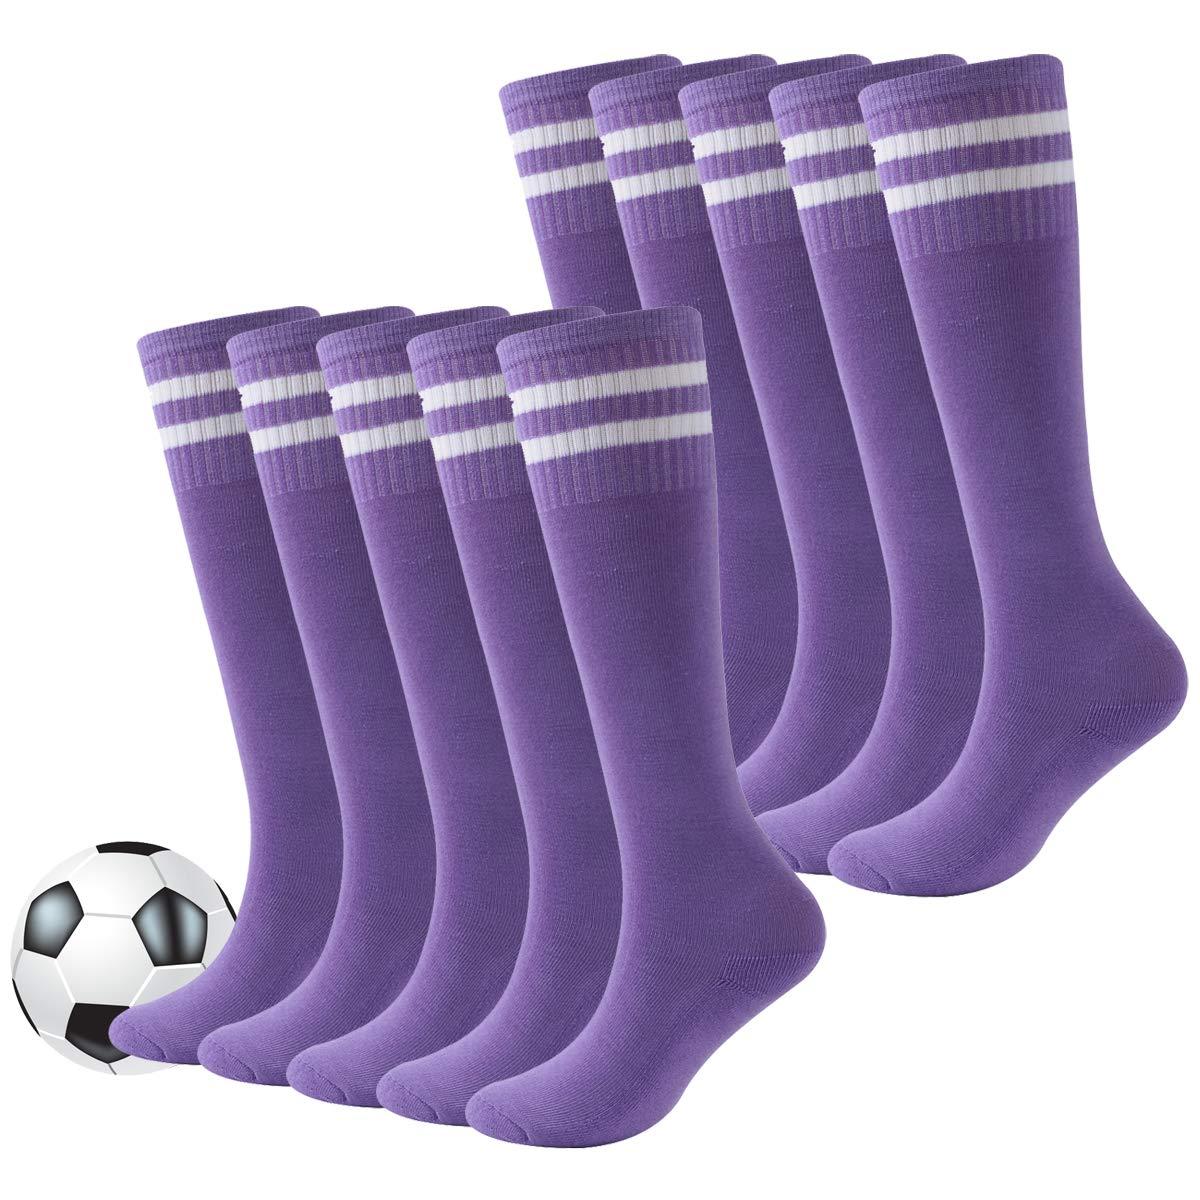 Kids Football Socks,Youth Long Knee High Active Outdoor Sports Soccer Tube Socks Fasoar 10 Pairs Purple by Fasoar